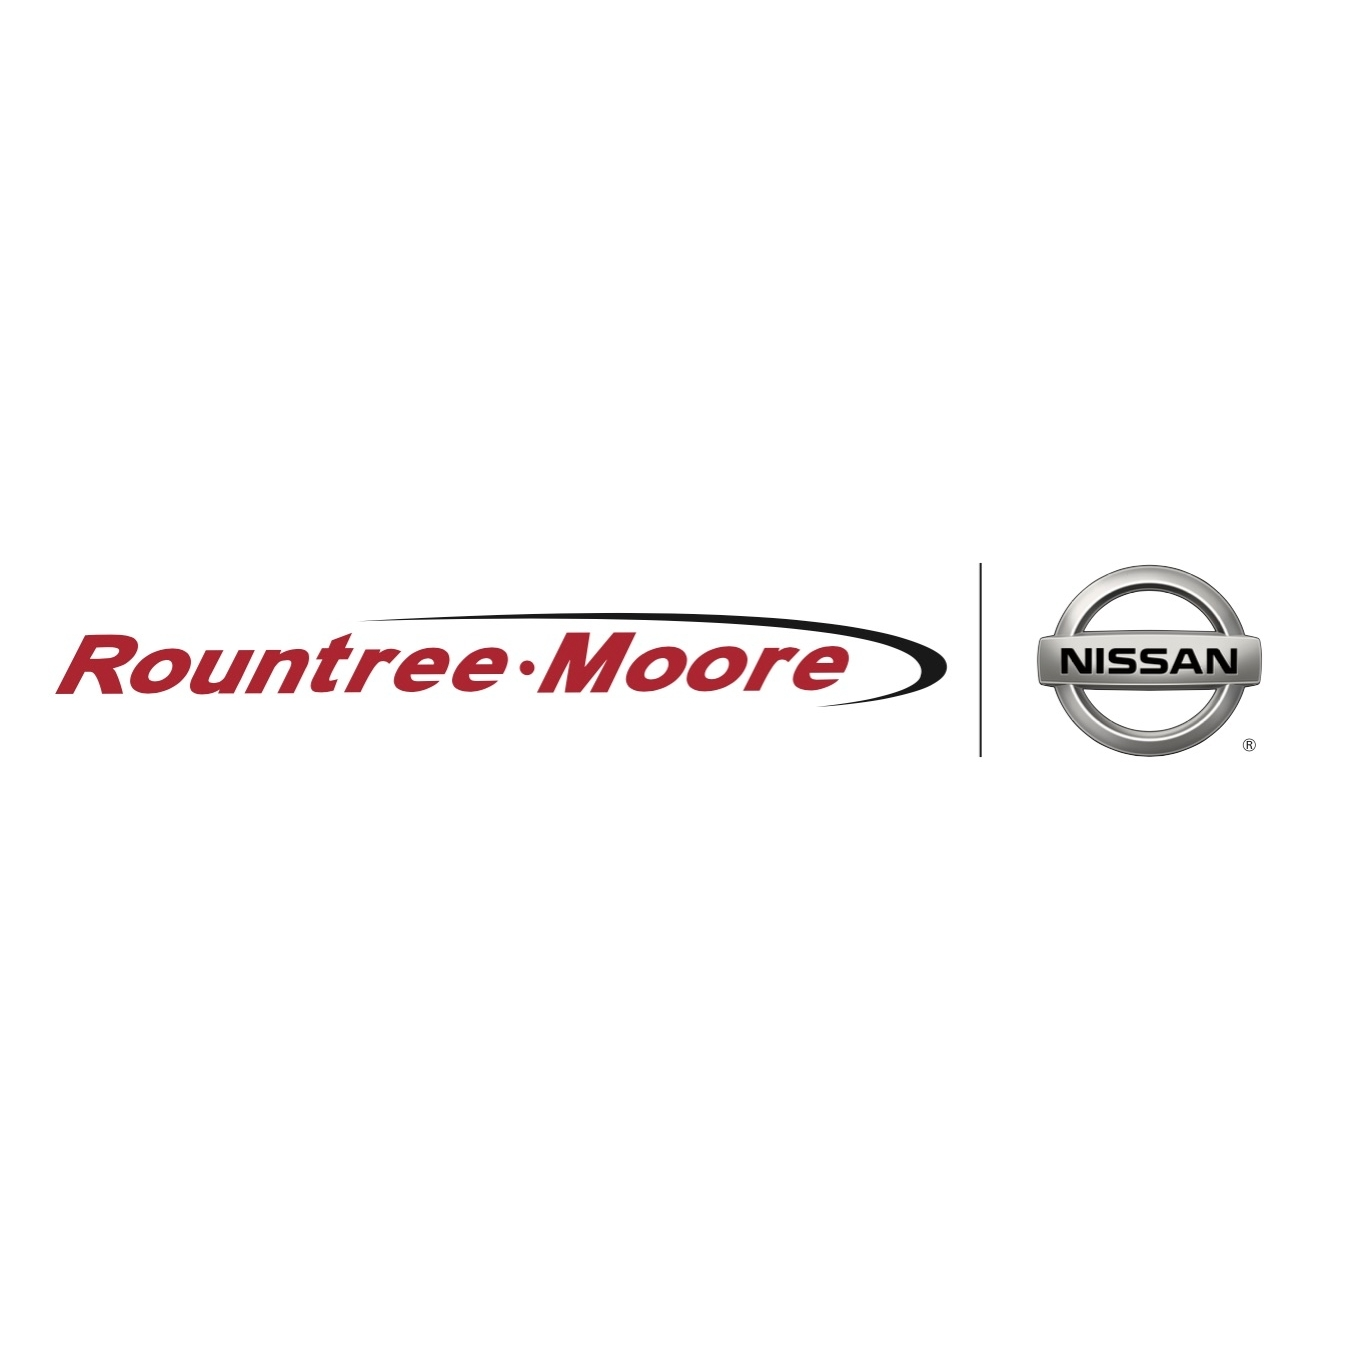 Rountree Moore Nissan